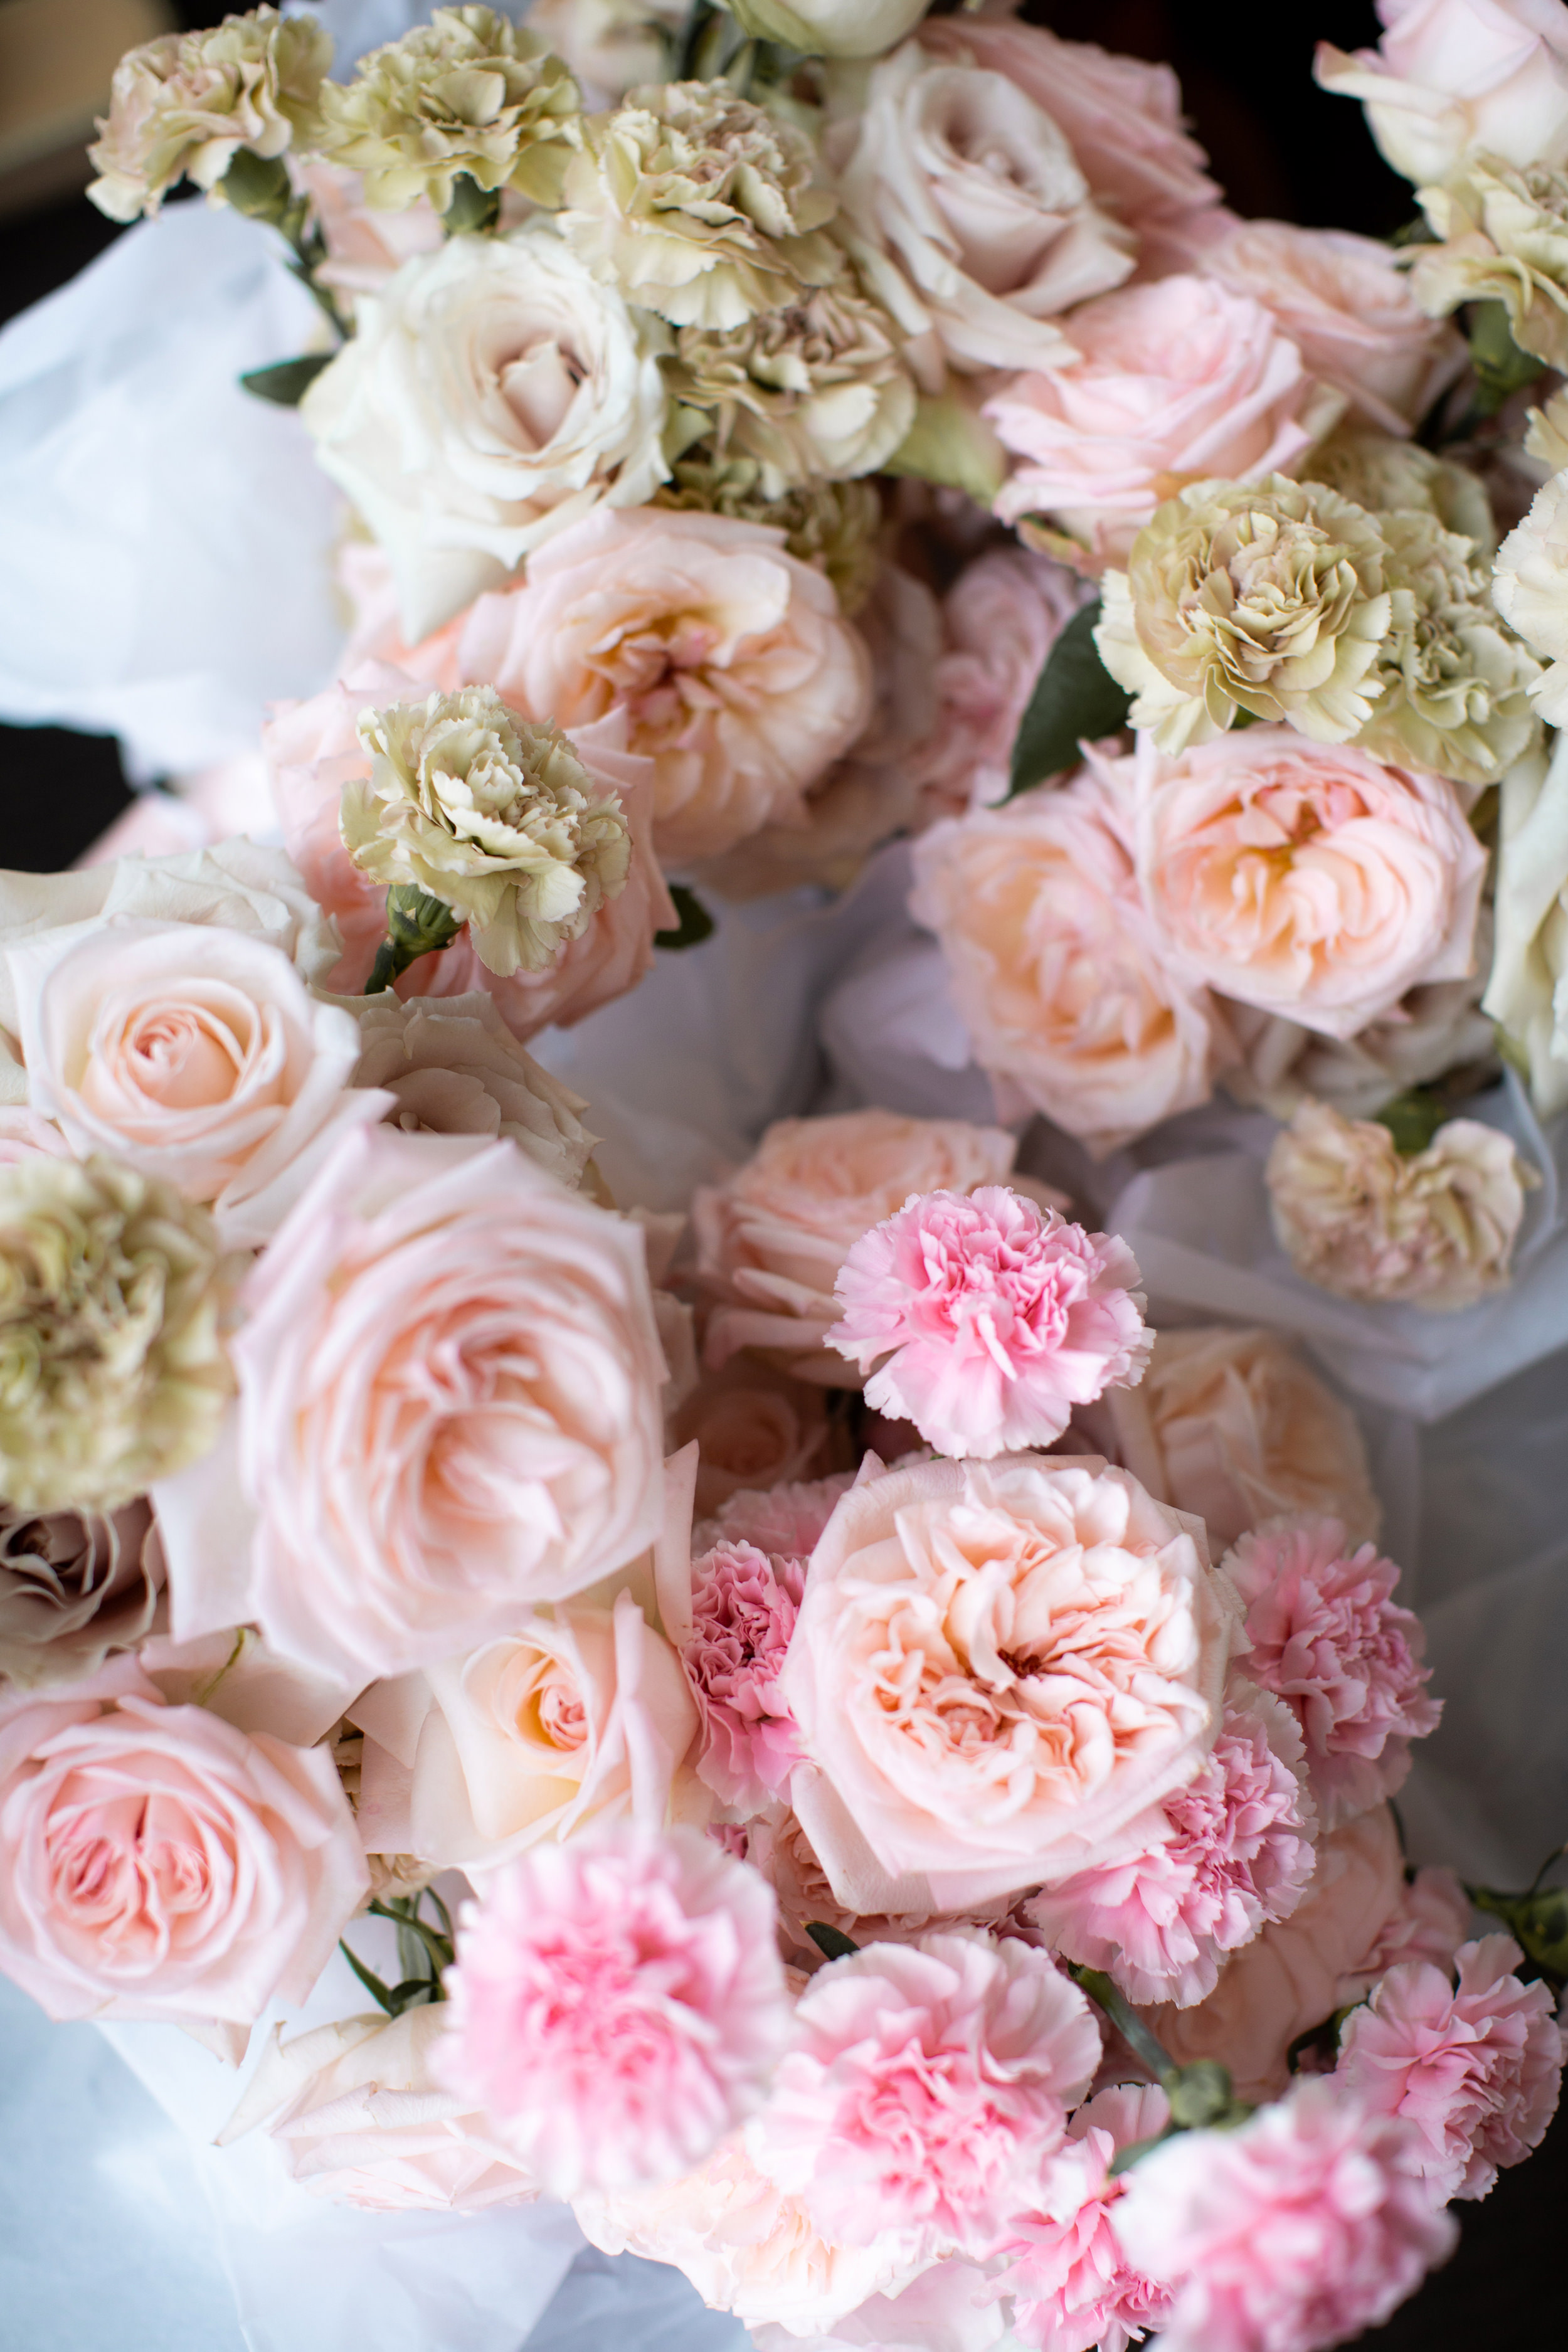 I-Got-You-Babe-Weddings-Tahlia&Mitch-Butler-Lane-Wedding0032.JPG